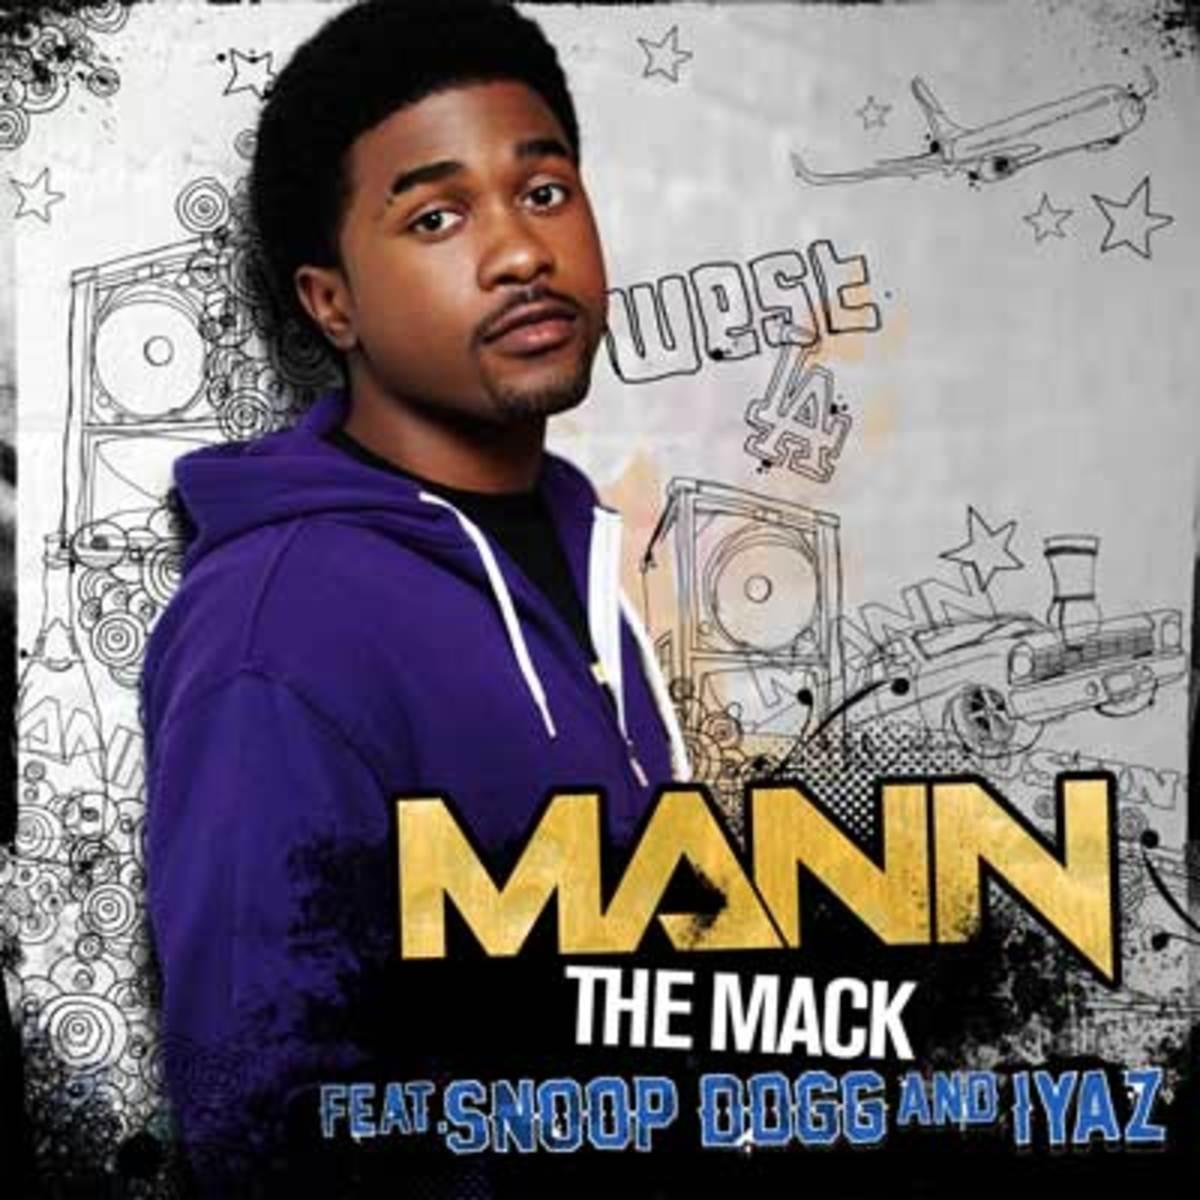 mann-themack2.jpg